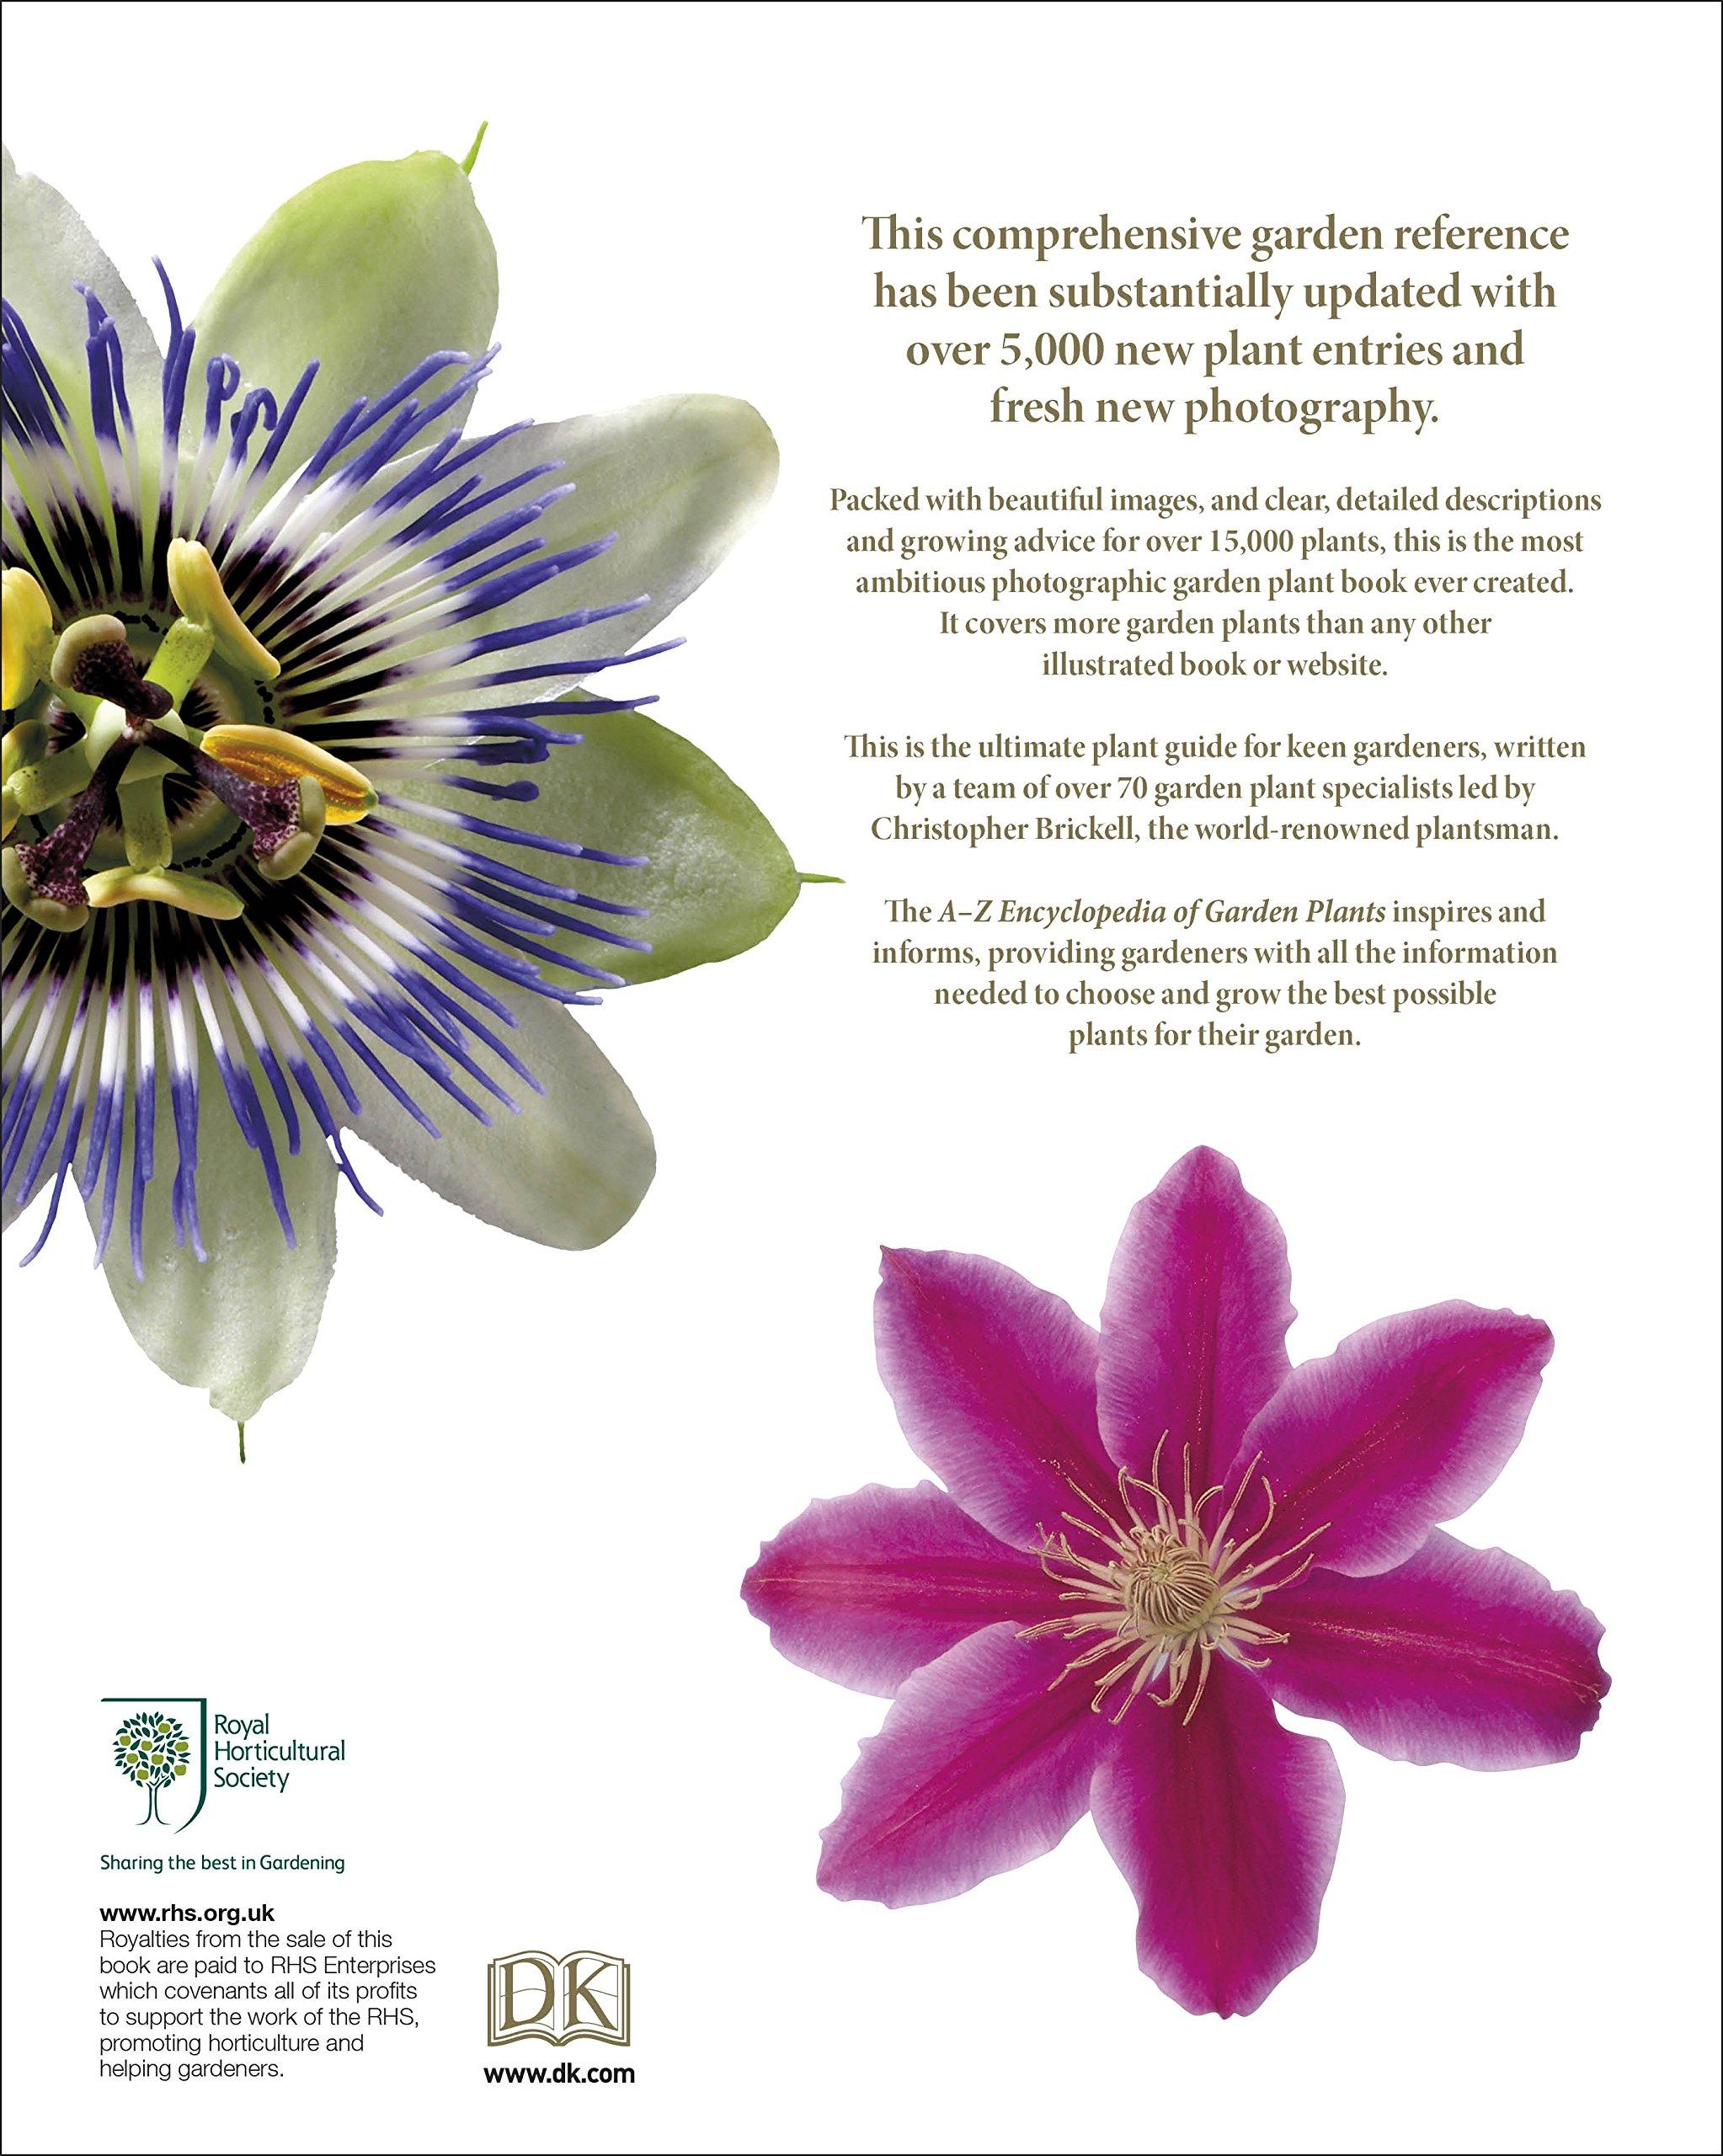 Rhs a z encyclopedia of garden plants dk 9780241239124 amazon rhs a z encyclopedia of garden plants dk 9780241239124 amazon books izmirmasajfo